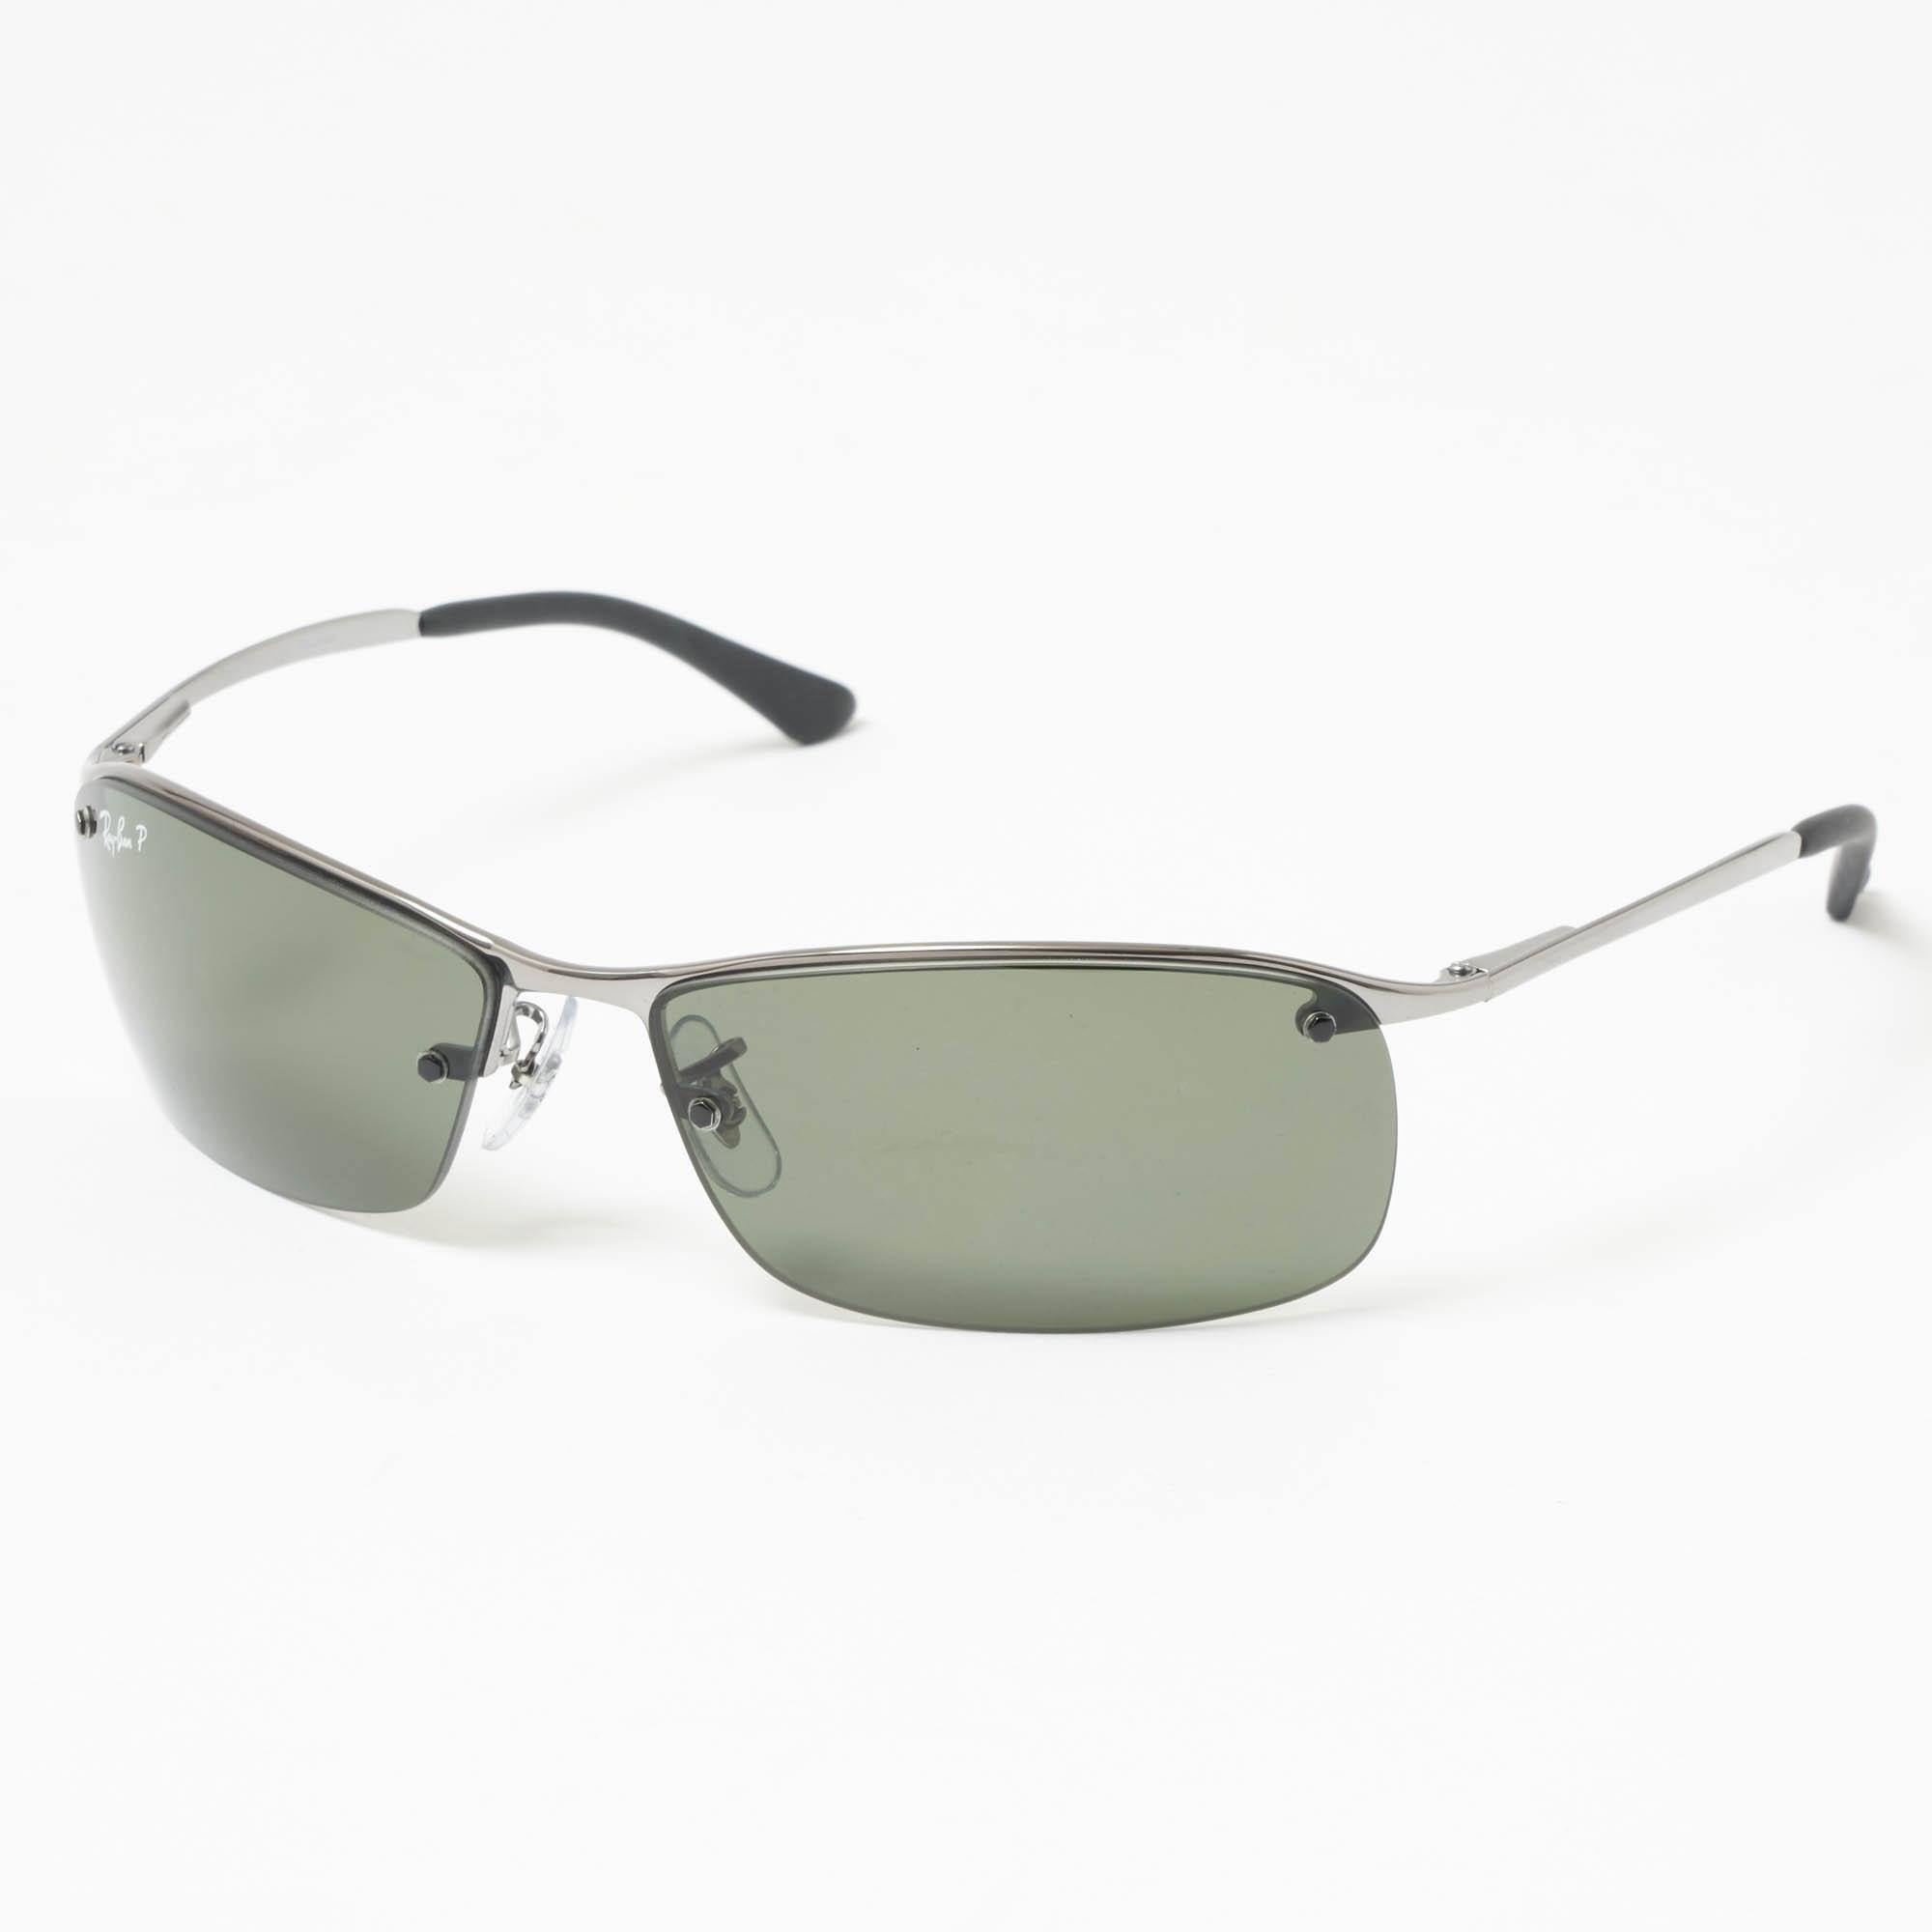 Ray-Ban Chrome Rb3183 Sunglasses Classic Green Lenses Rb3183-004 Colou for Men